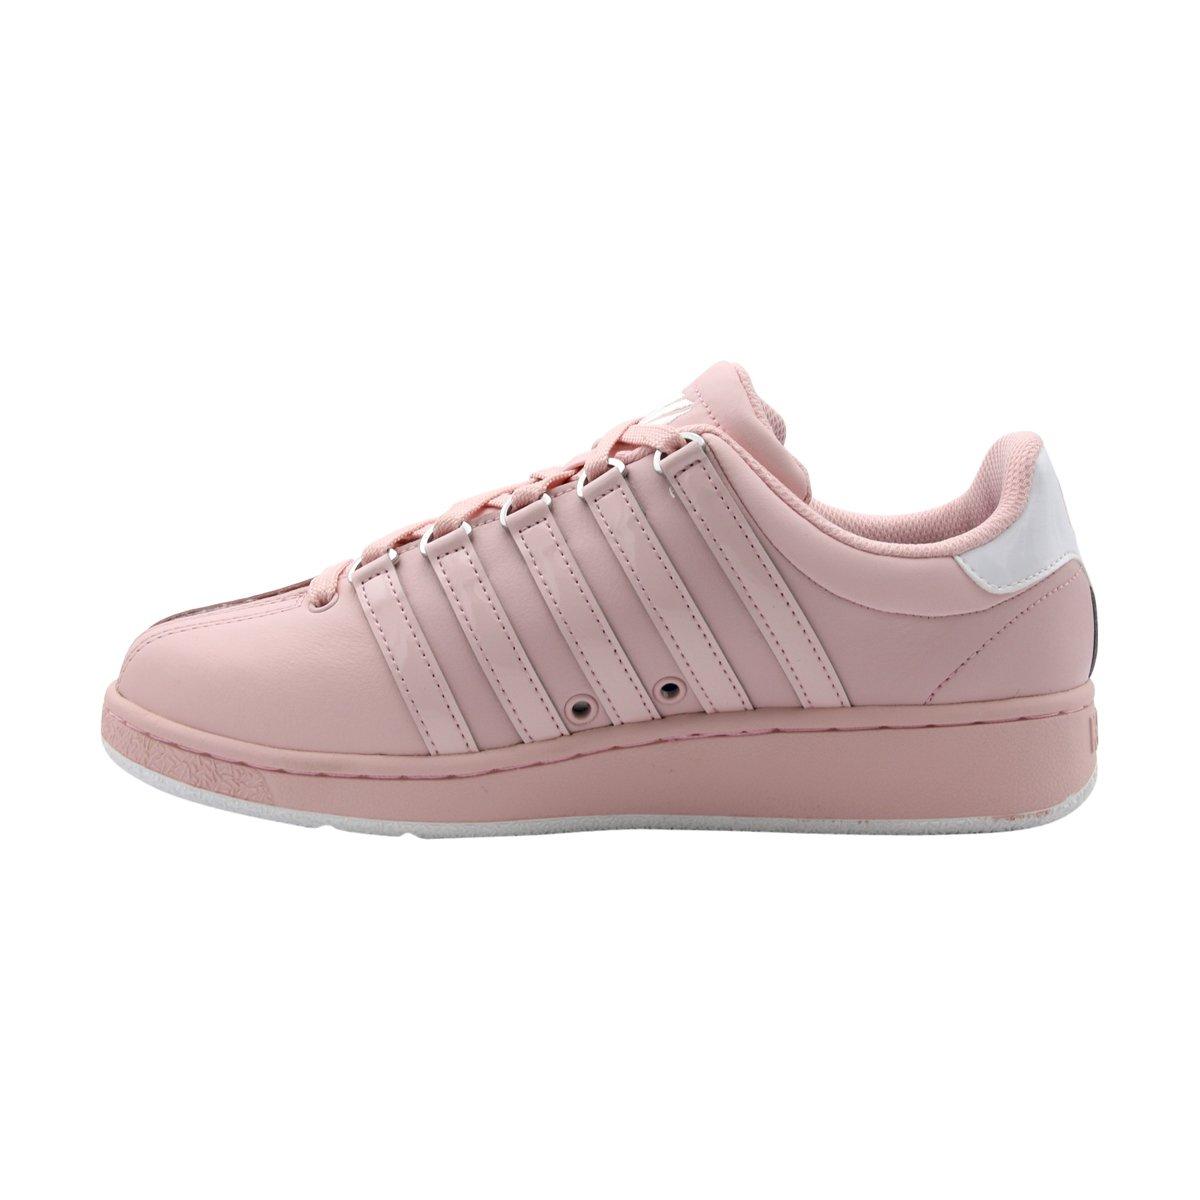 K-Swiss Women's Classic Vn Sneaker B01M09QMIG 7 B(M) US|Potpourri/White